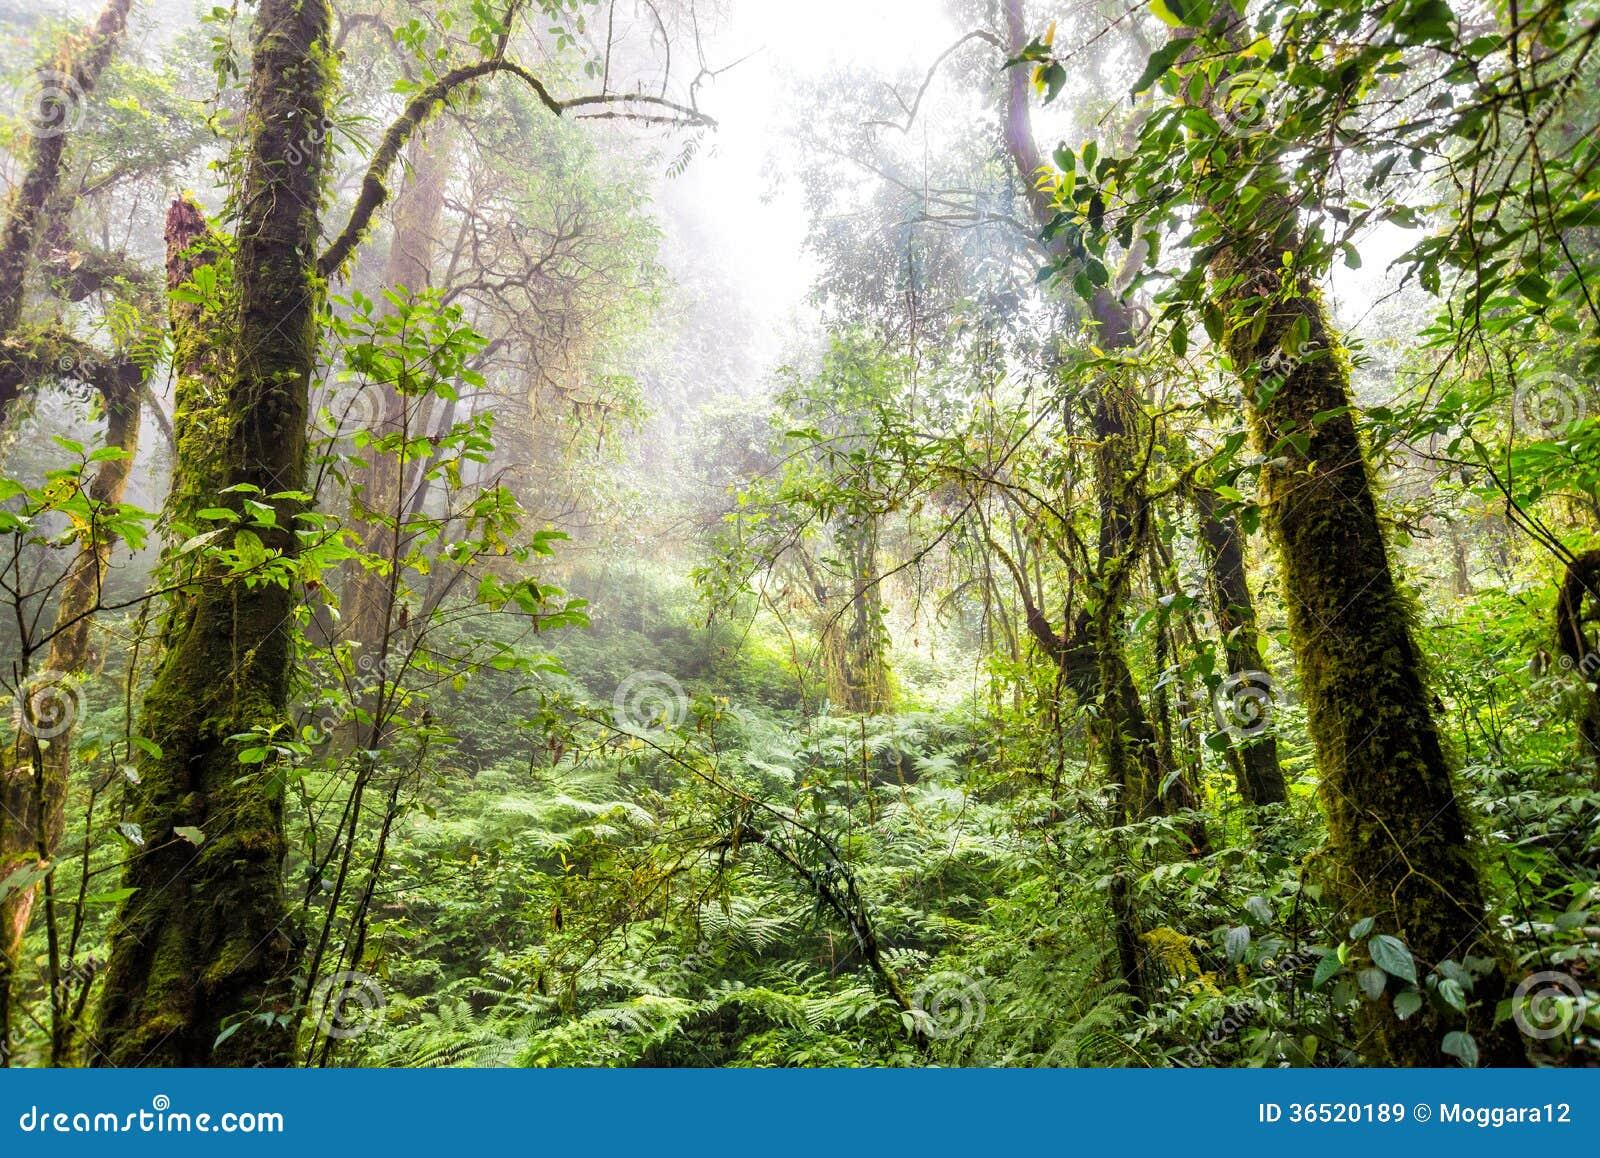 Tree forest in autumn season of thailand